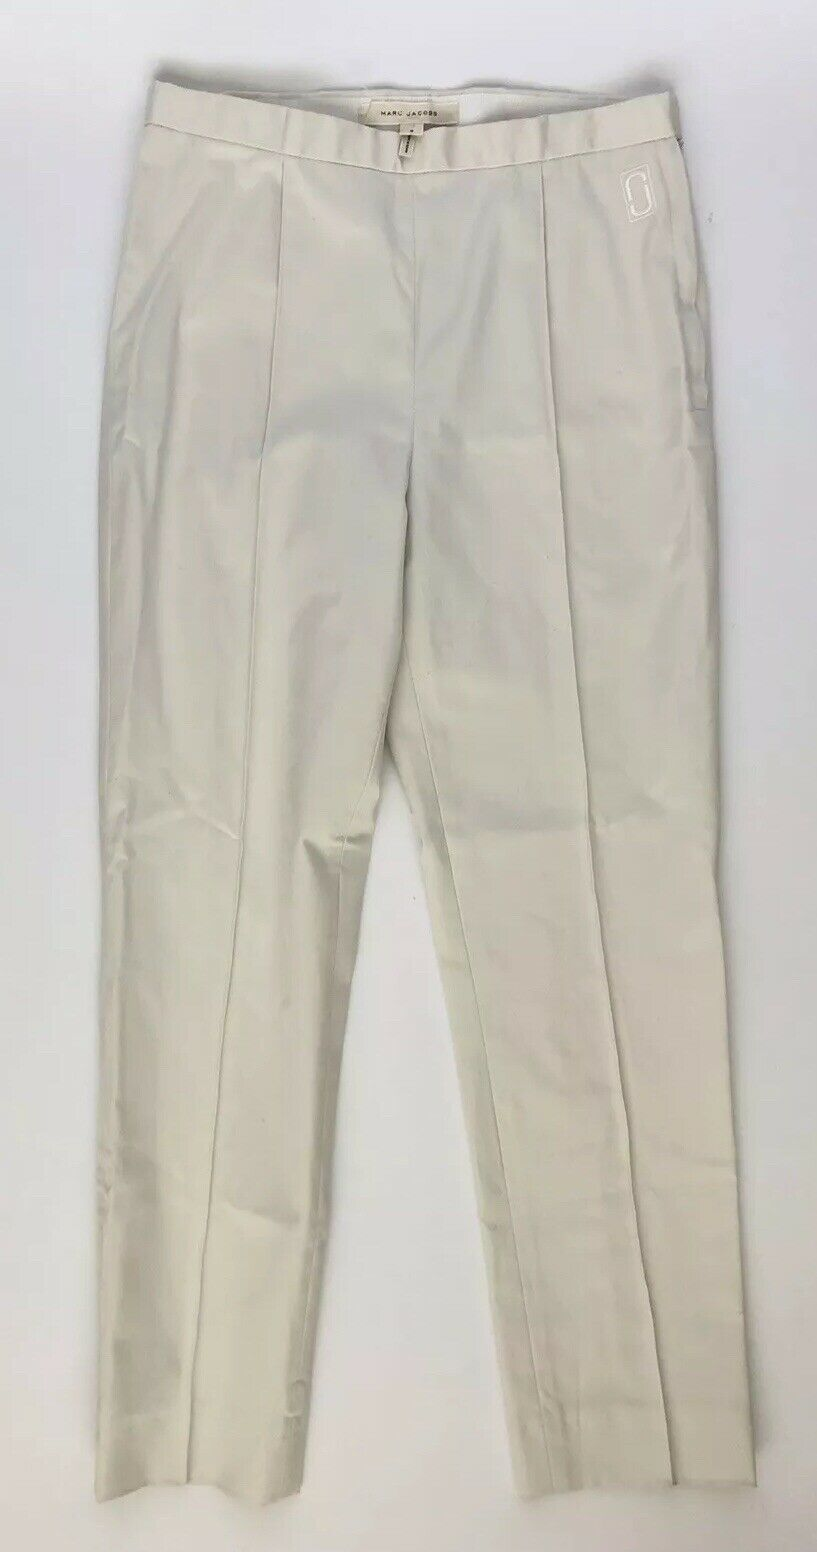 Marc Jacobs Women Pants Size 2 NWT Ivory Cotton